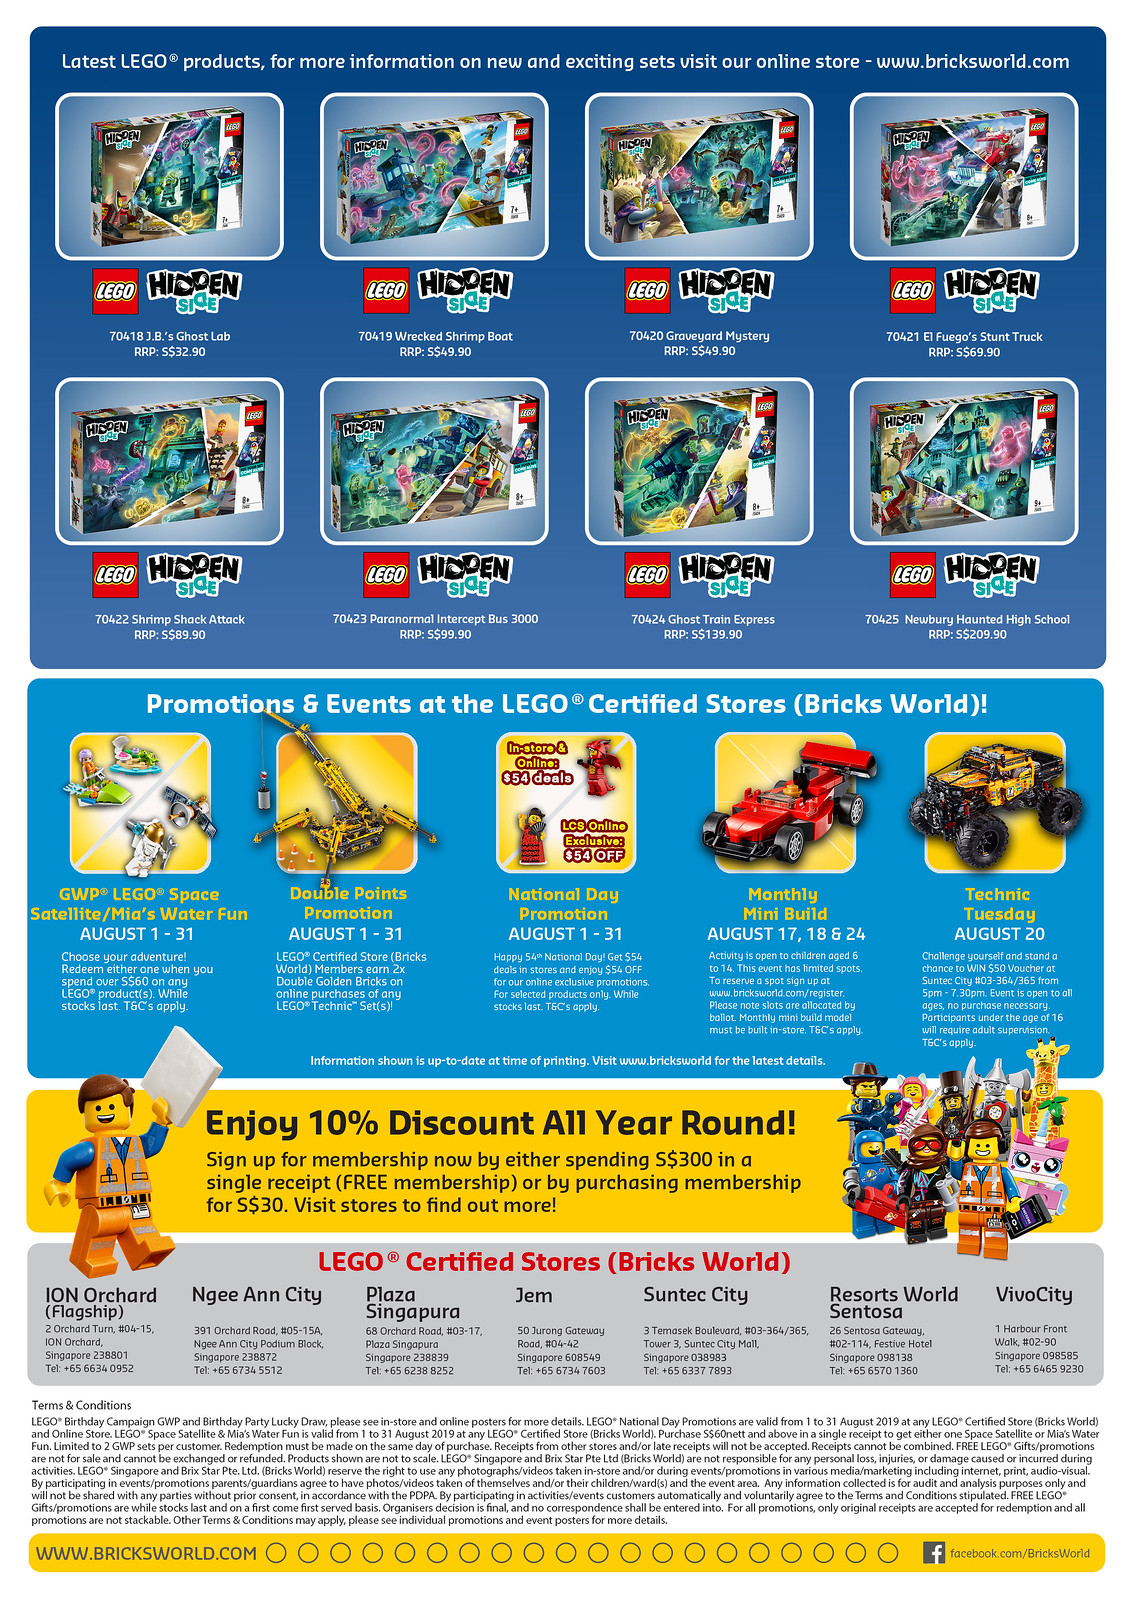 LEGO Certified Store Calendar August 2019 - Back